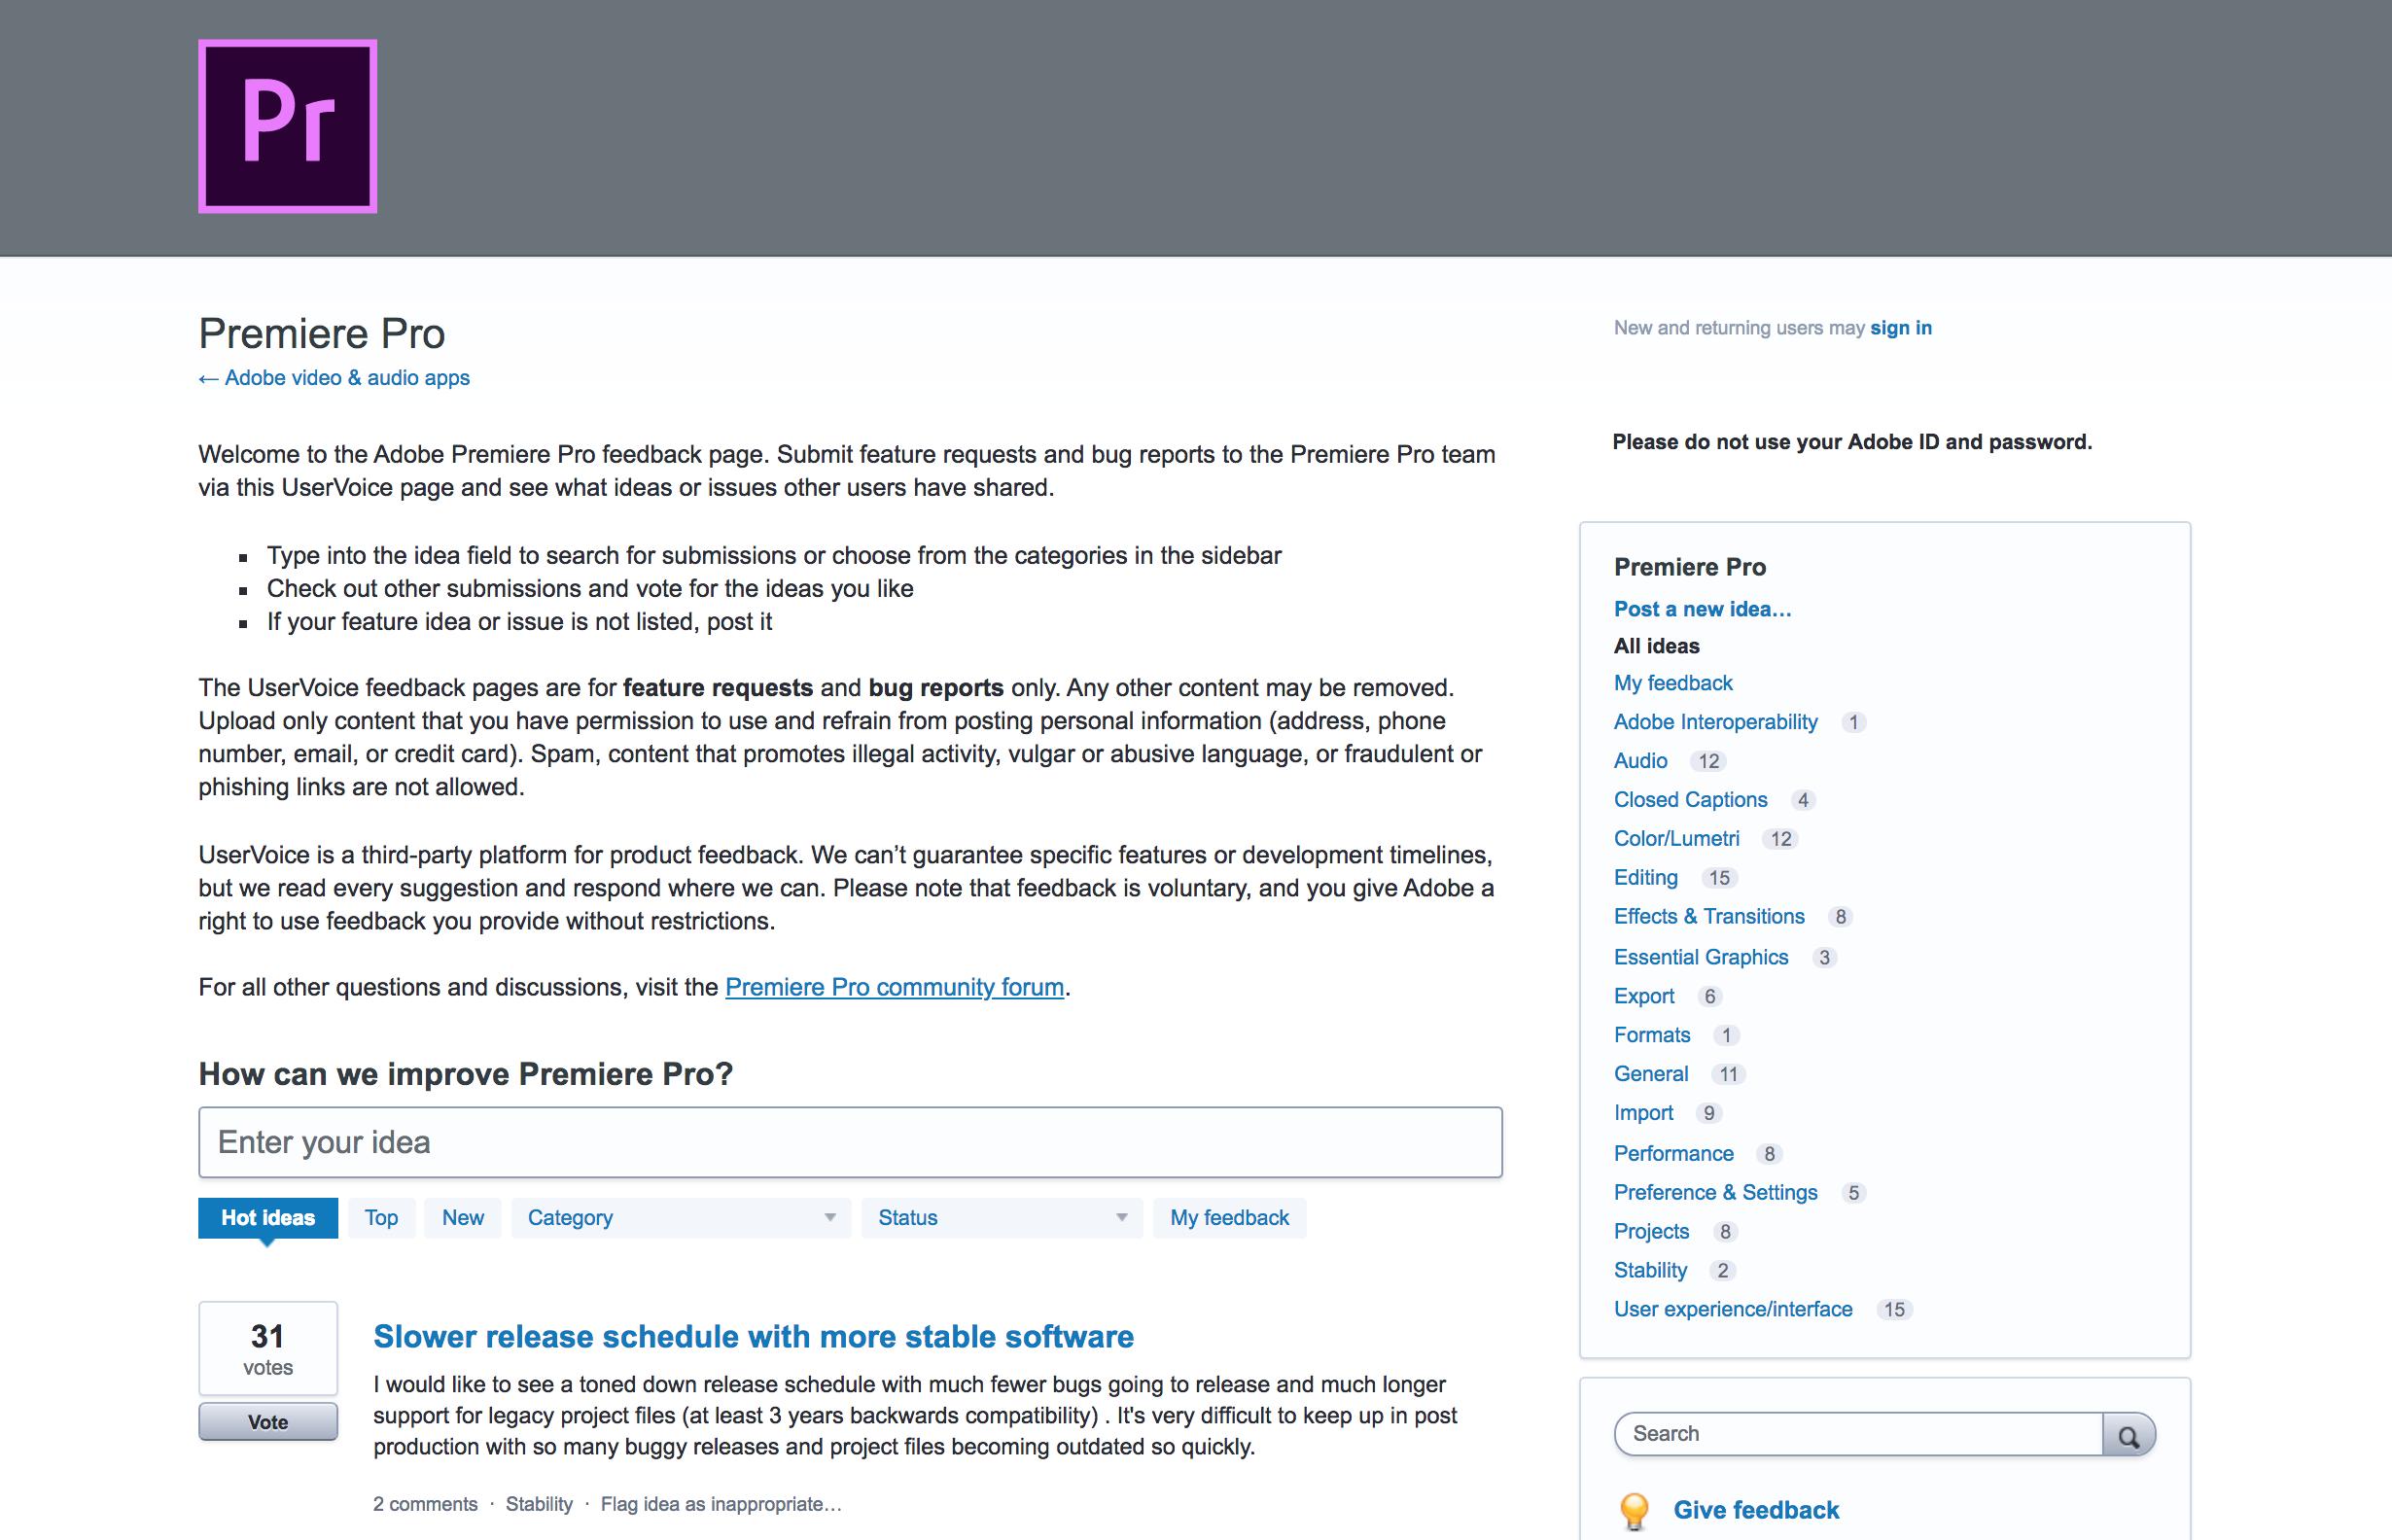 user-voice-bug-report-premiere-pro.png